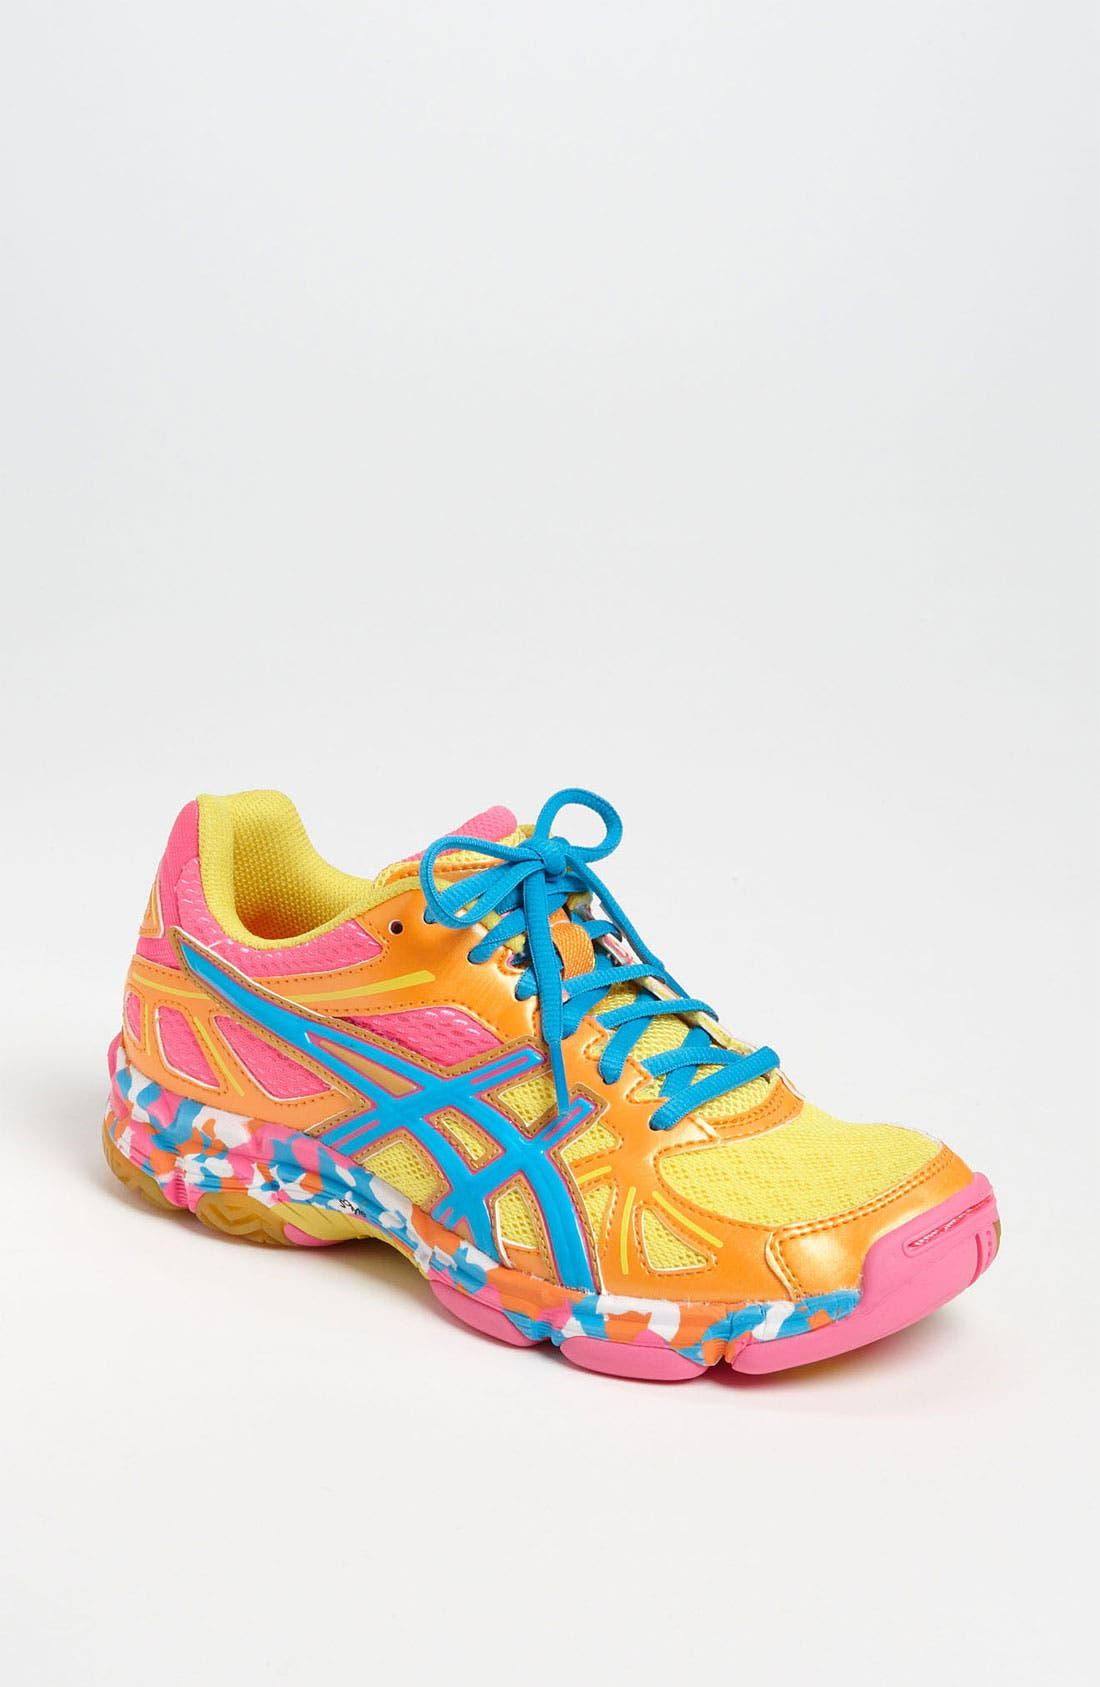 Main Image - ASICS® 'GEL-Flashpoint' Volleyball Shoe (Women)